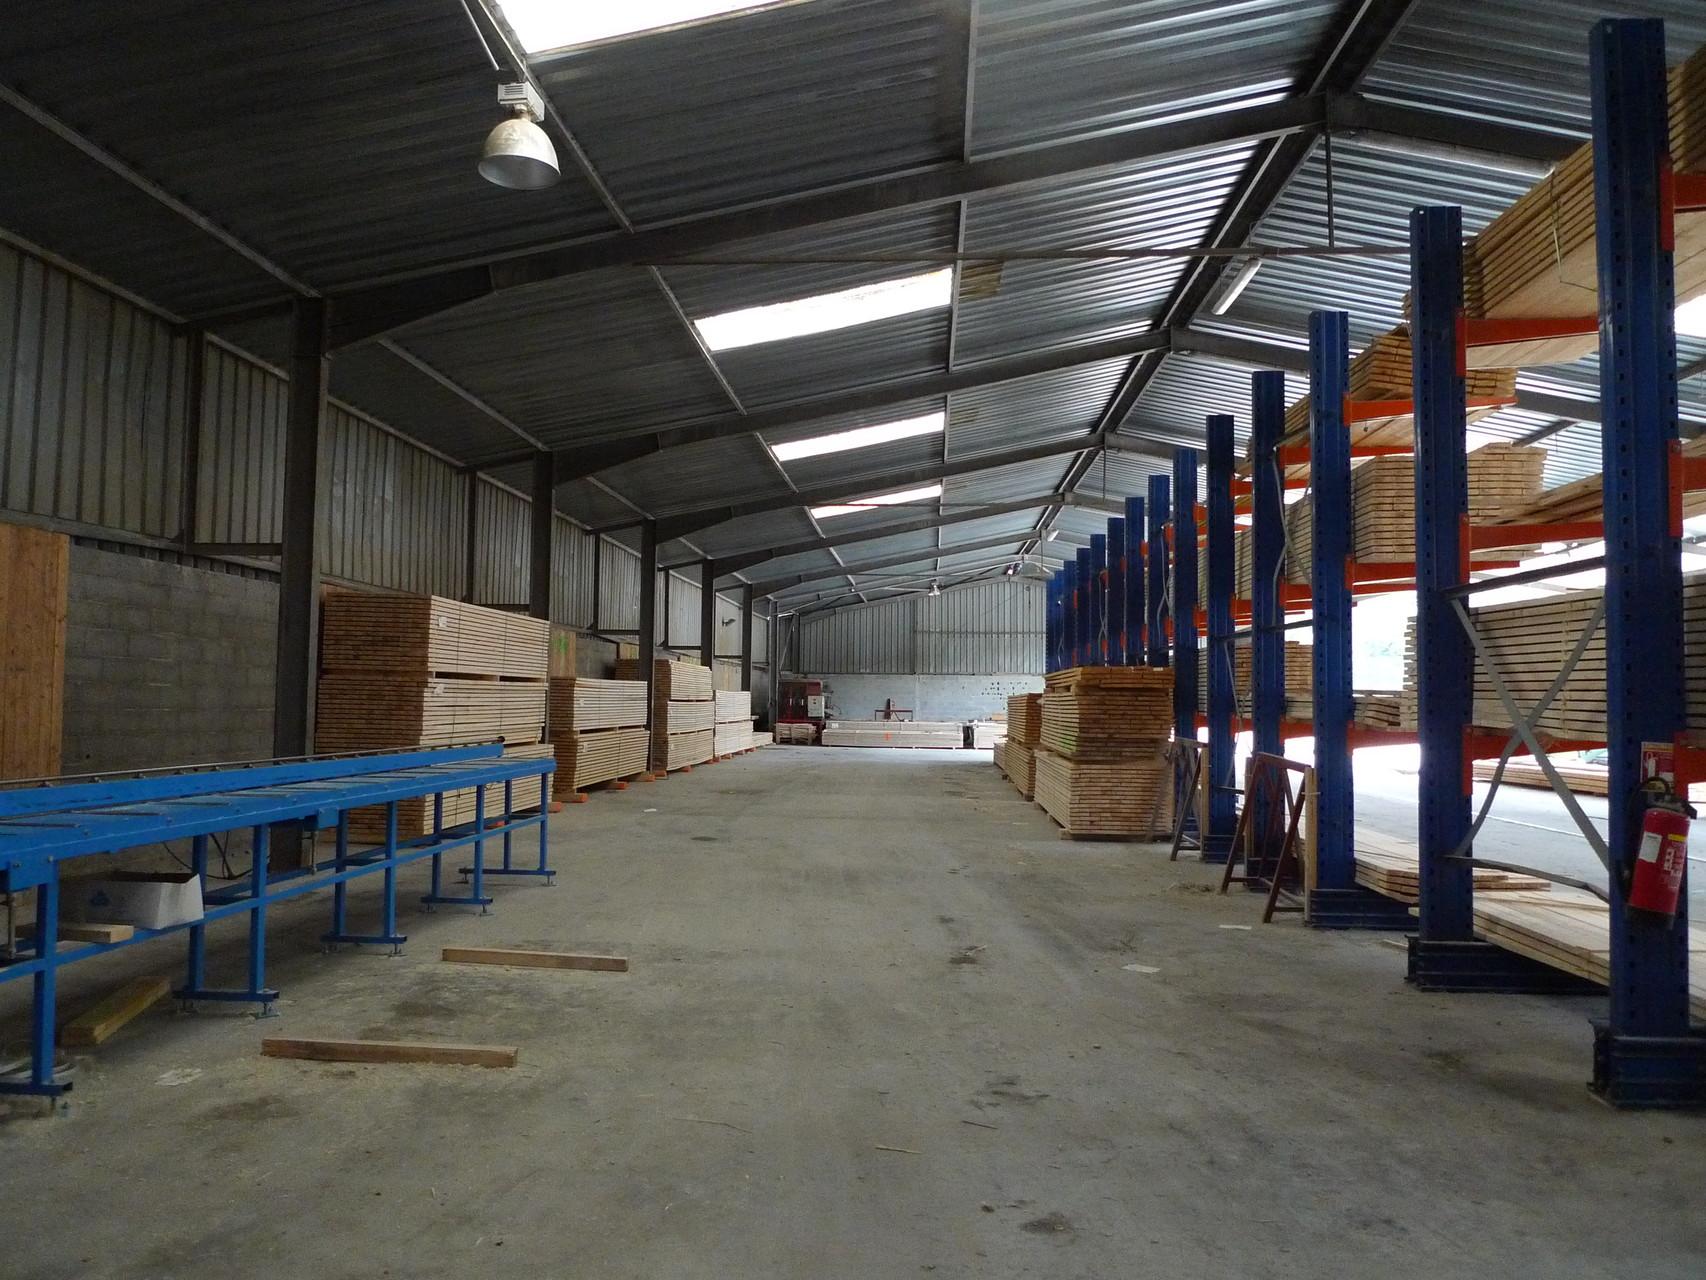 Vaucluse entrepot 84 a vendre immobilier vente achat immo acheter annon - Hangar a vendre nord ...